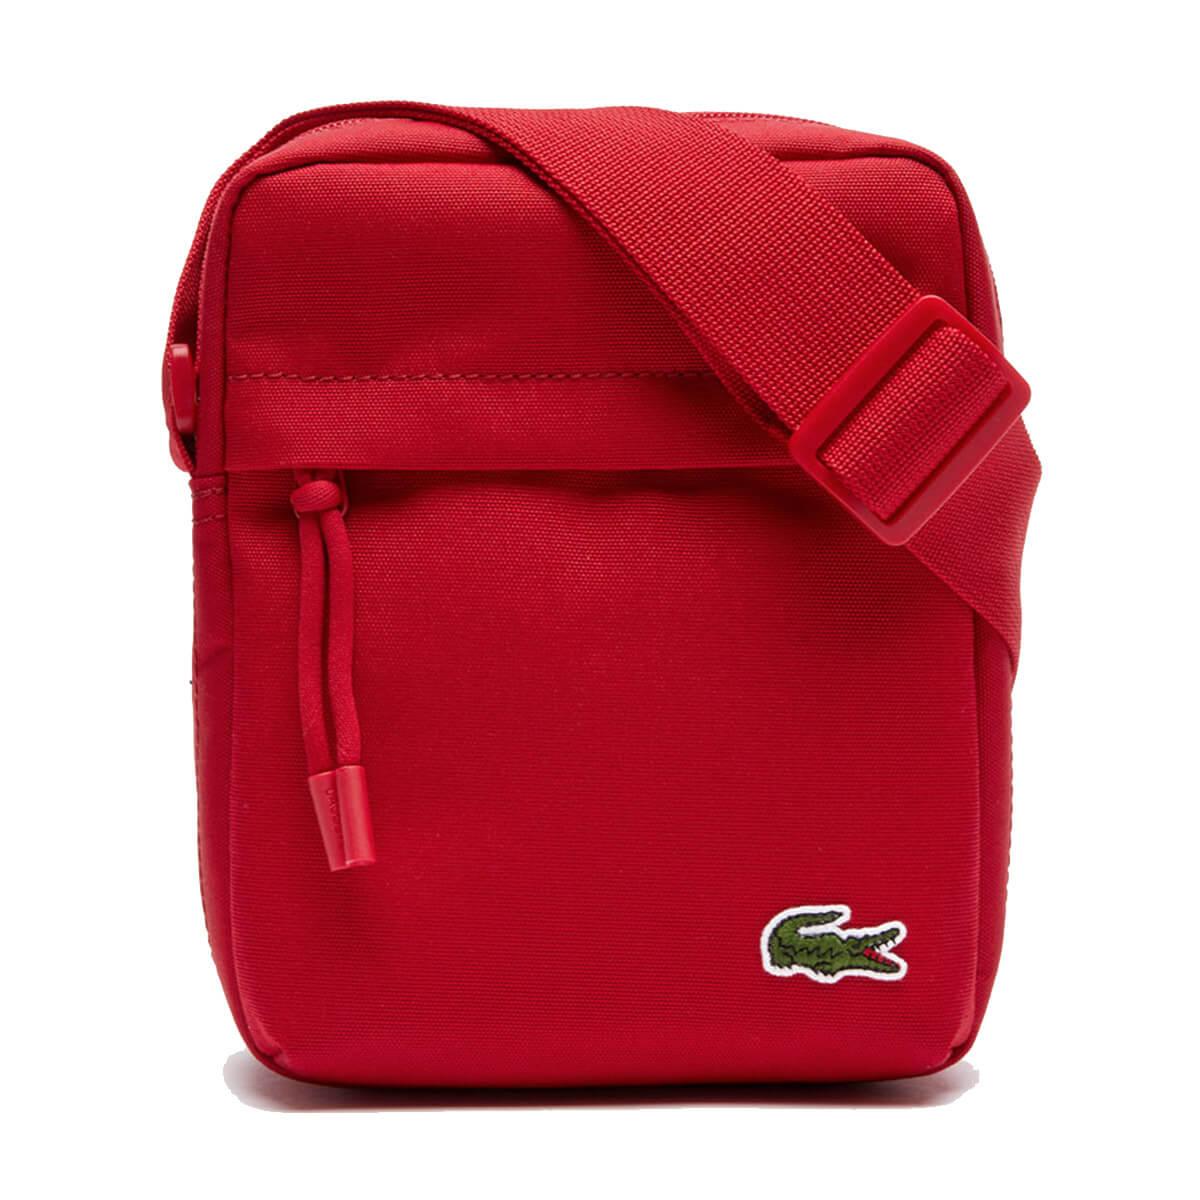 LACOSTE Shoulder Bag NH0323 Mens Classic Est Blue Coated Messenger Bags NEW R£80